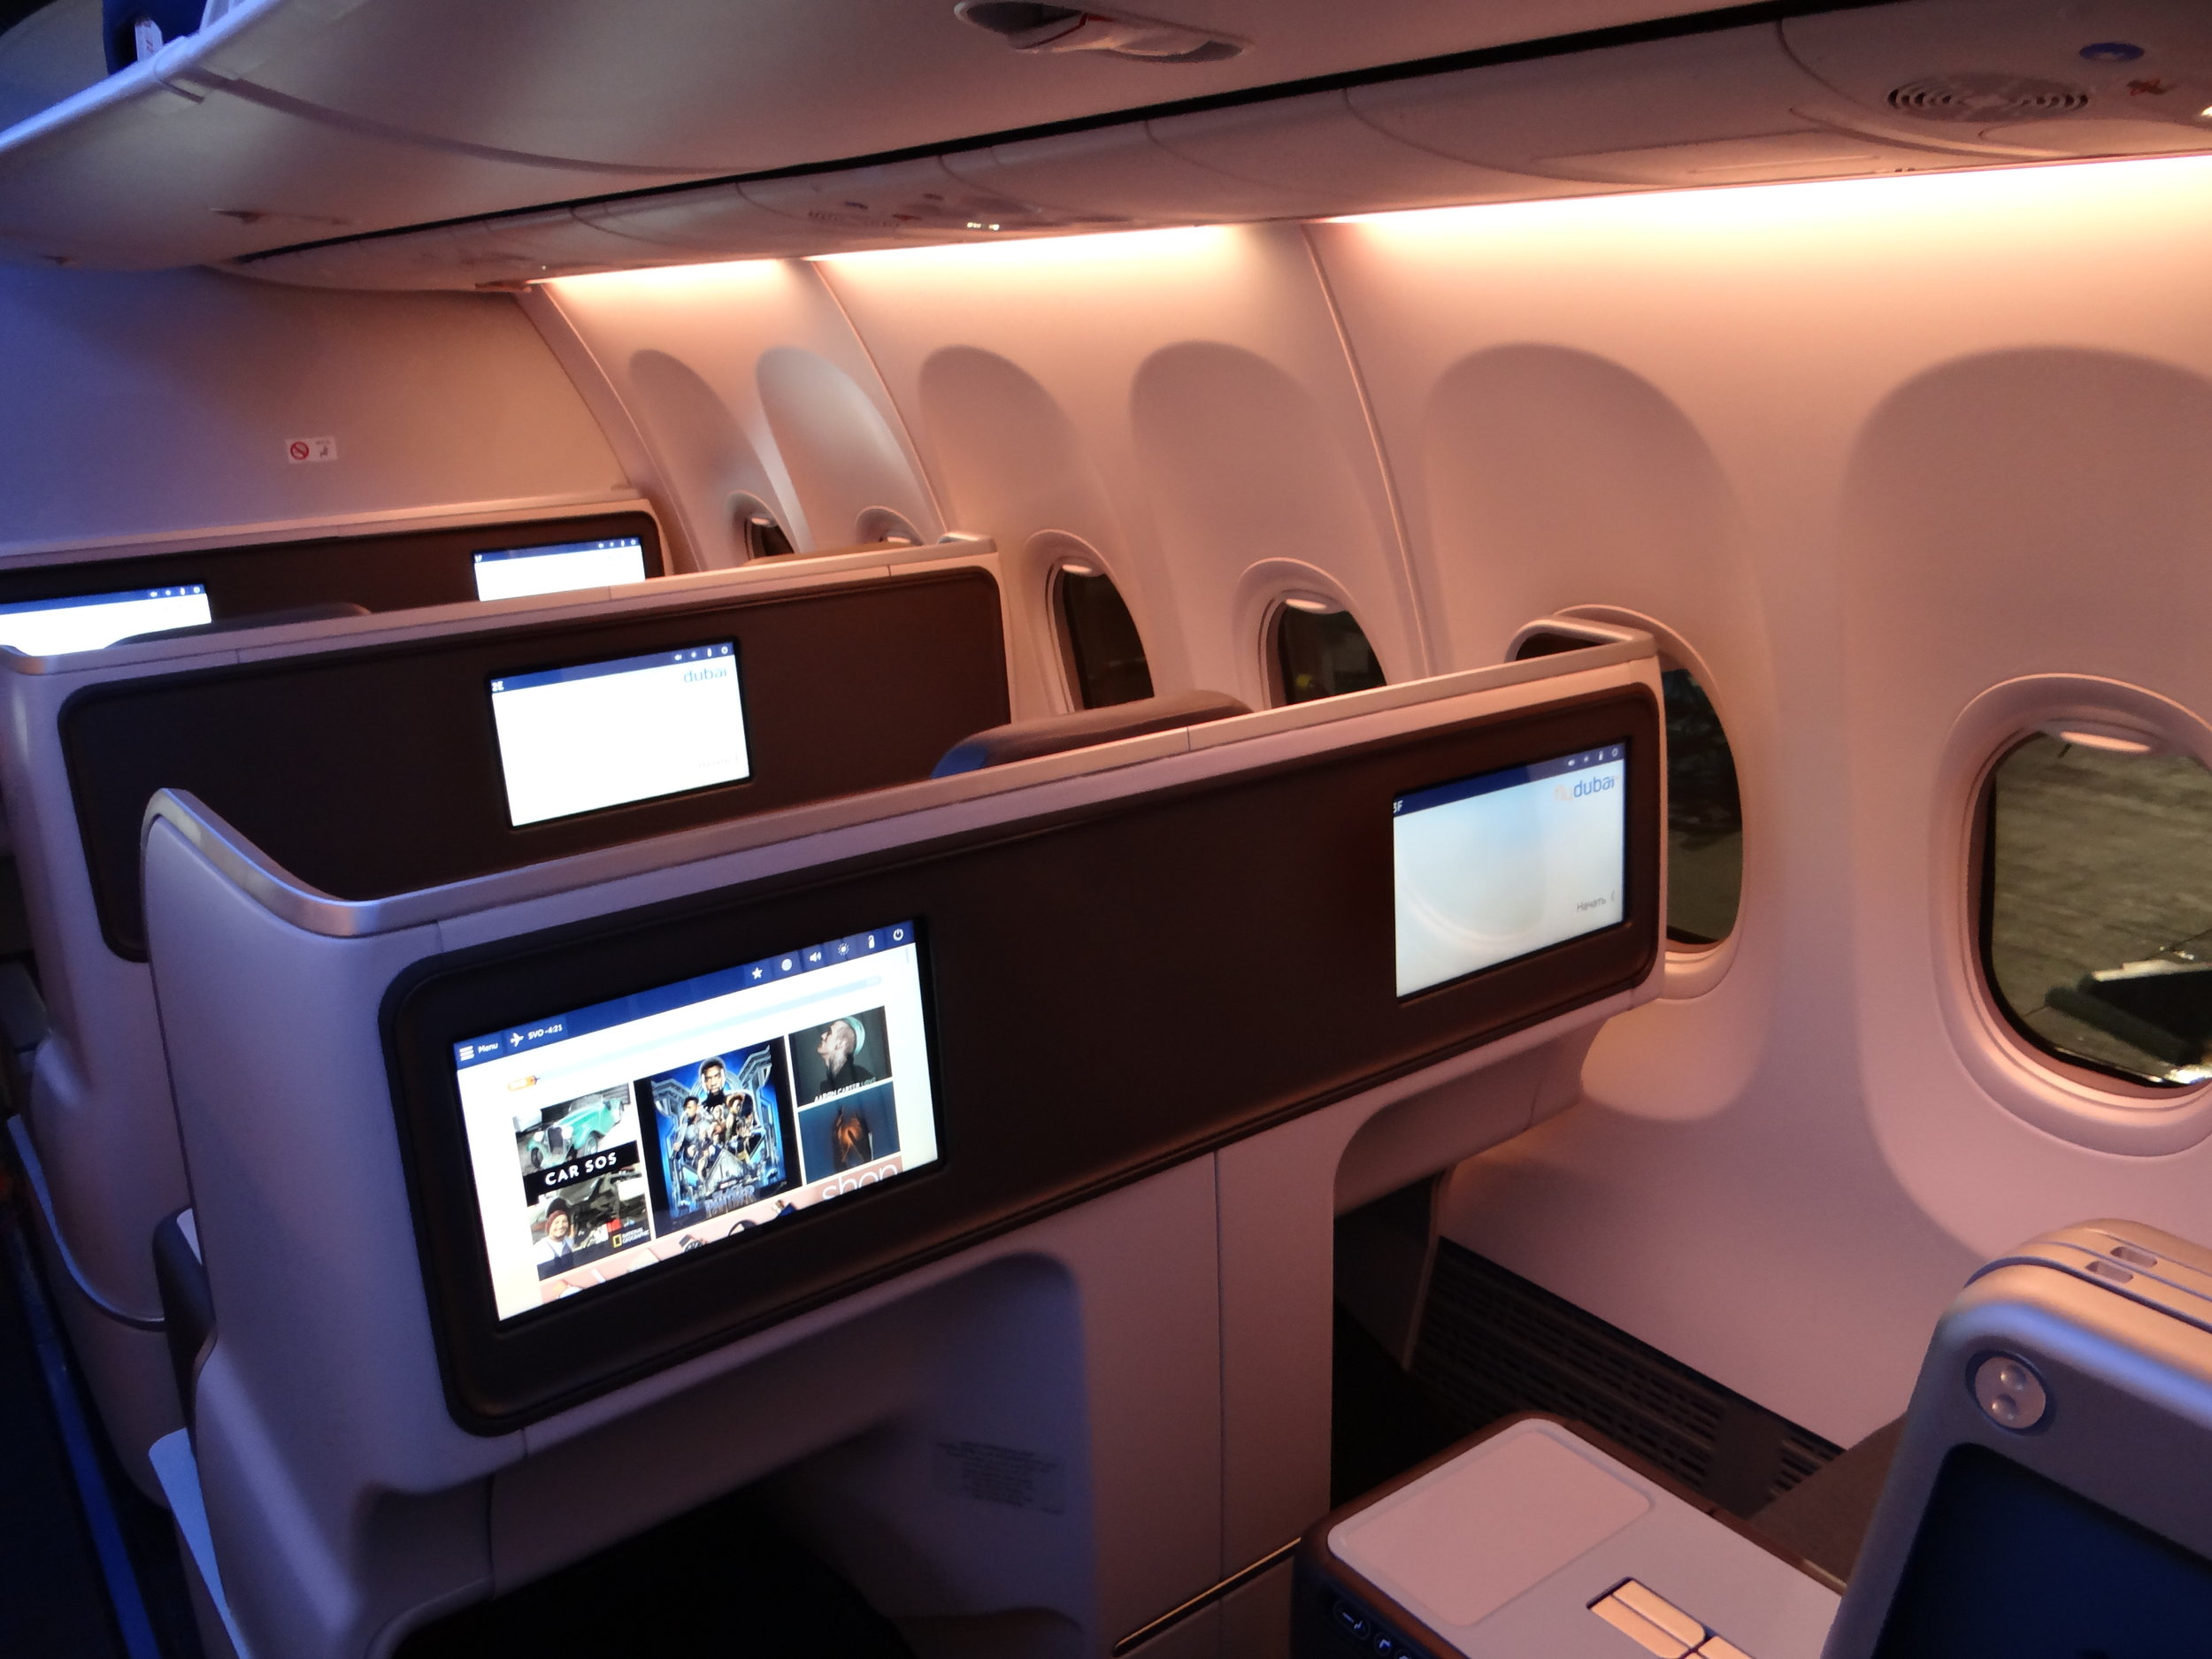 flydubai business class cabin.jpg